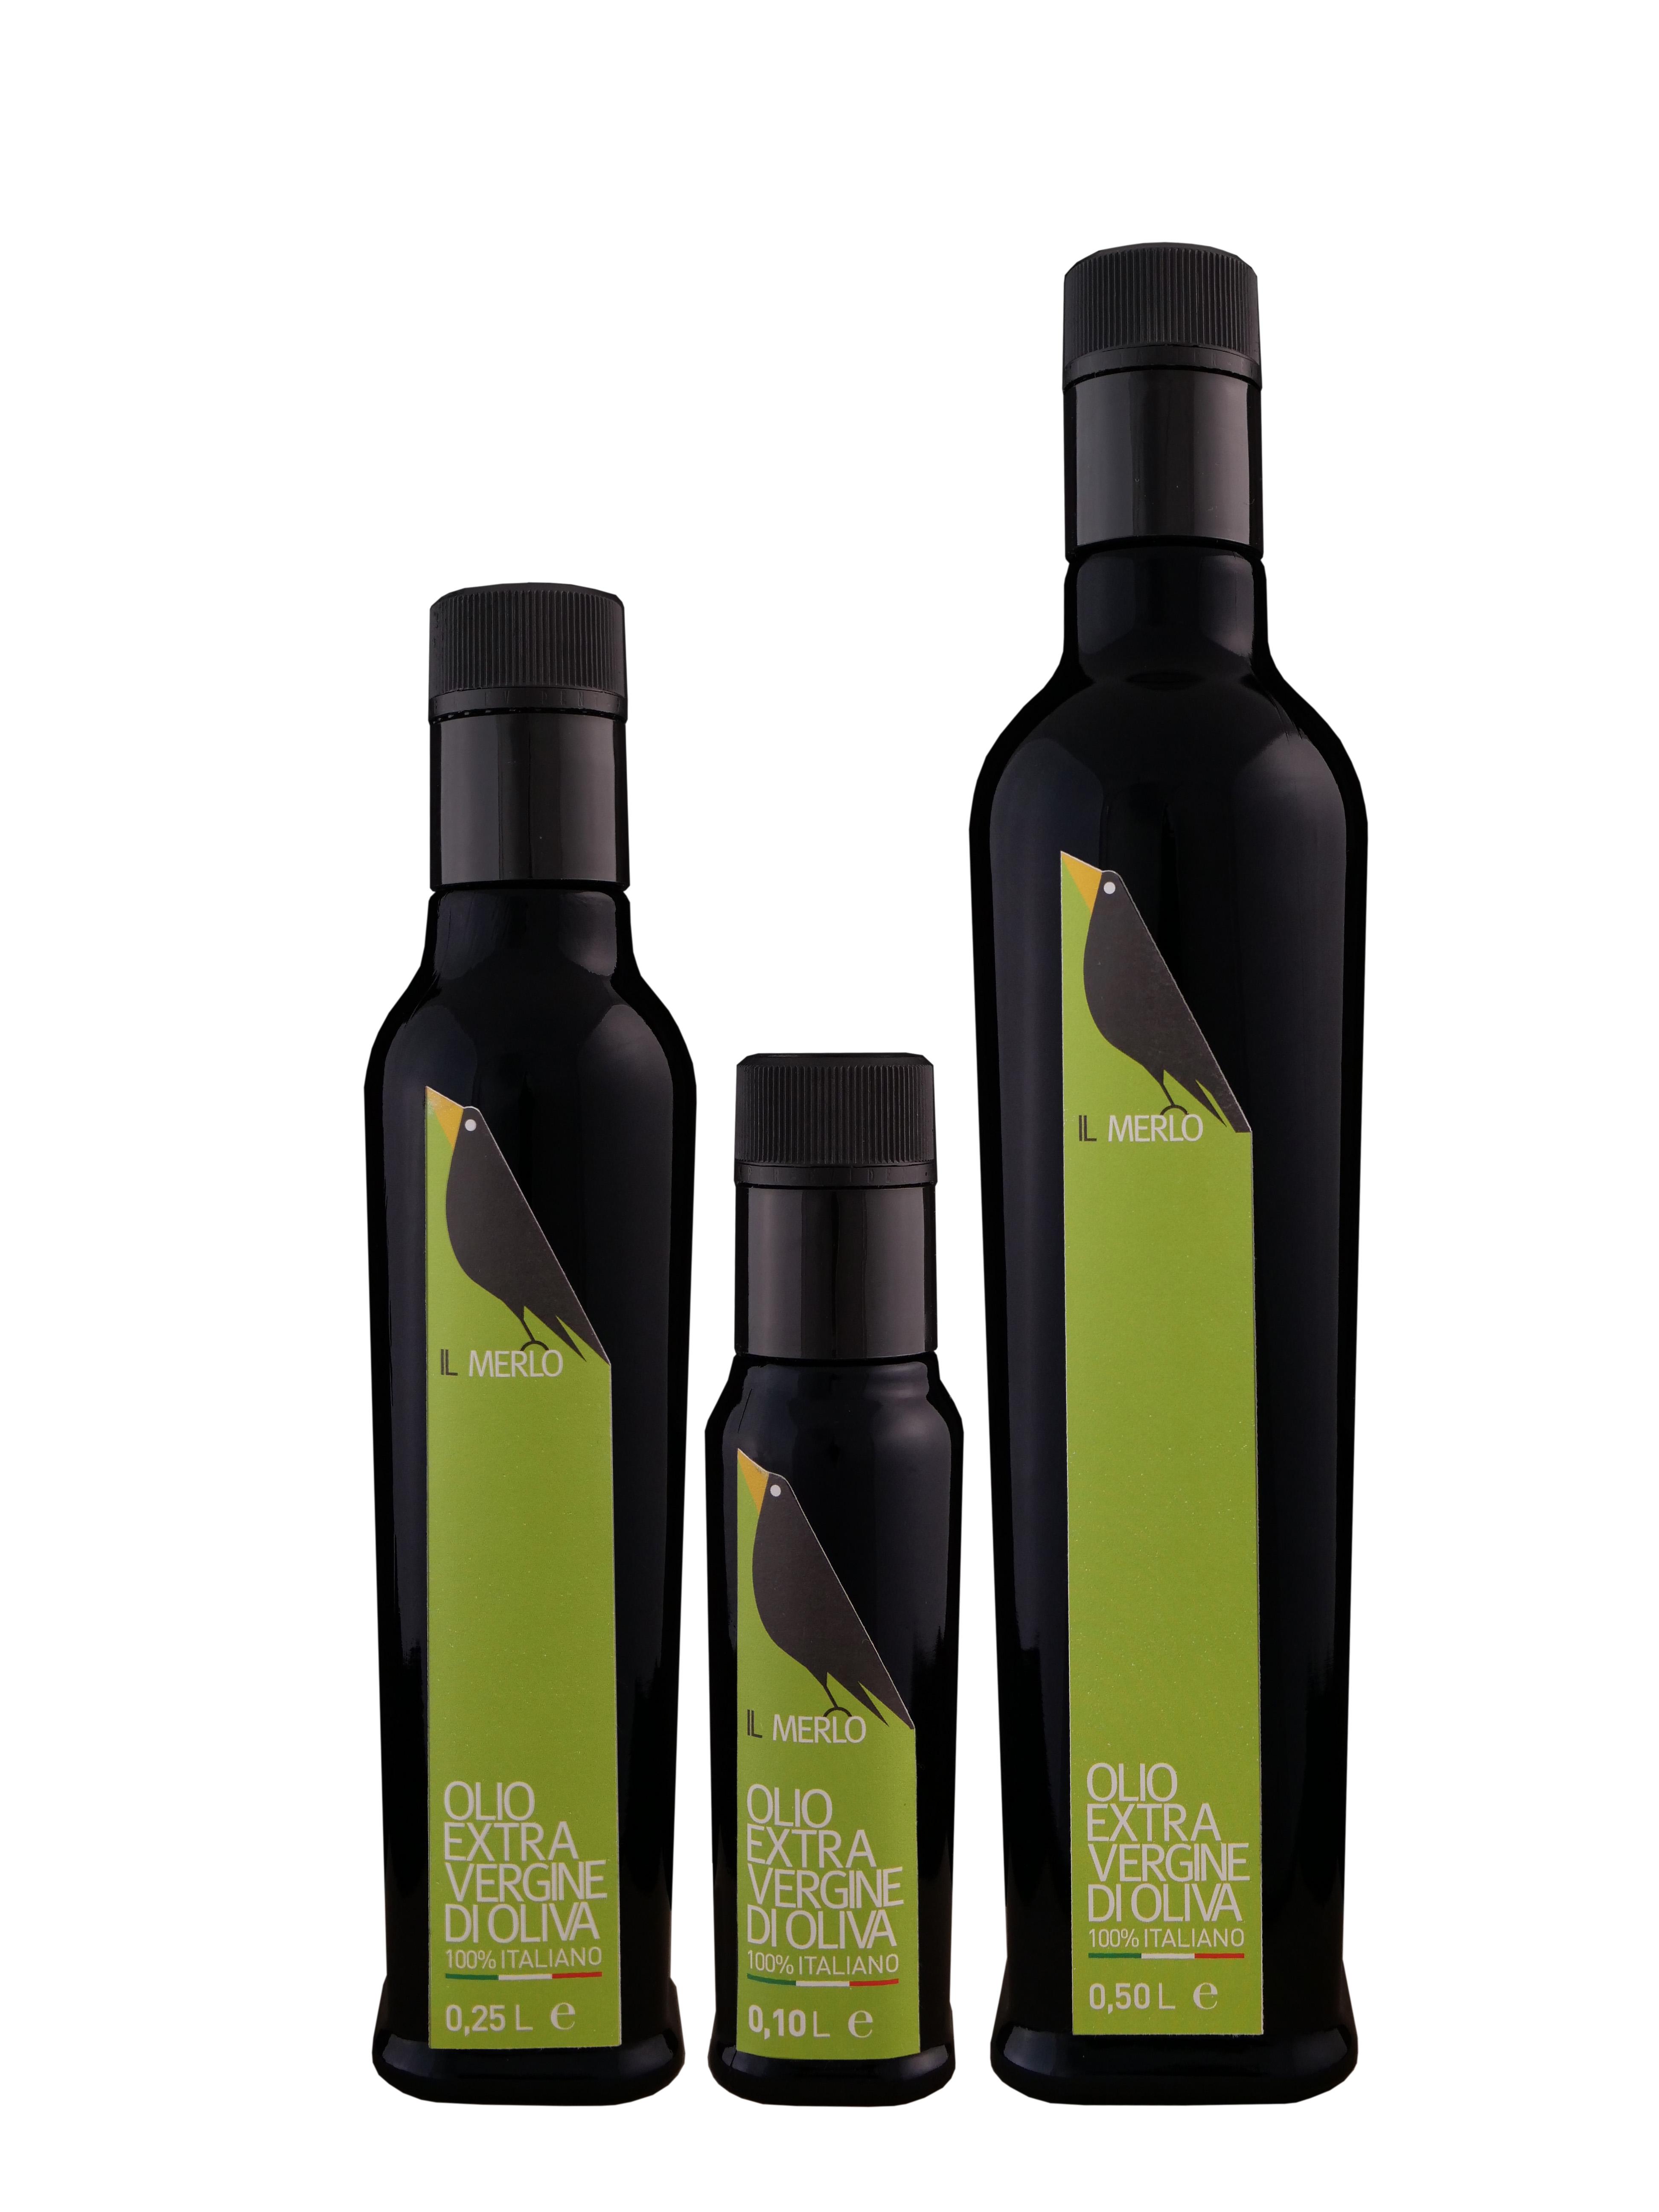 Tris Bottiglie Il Merlo